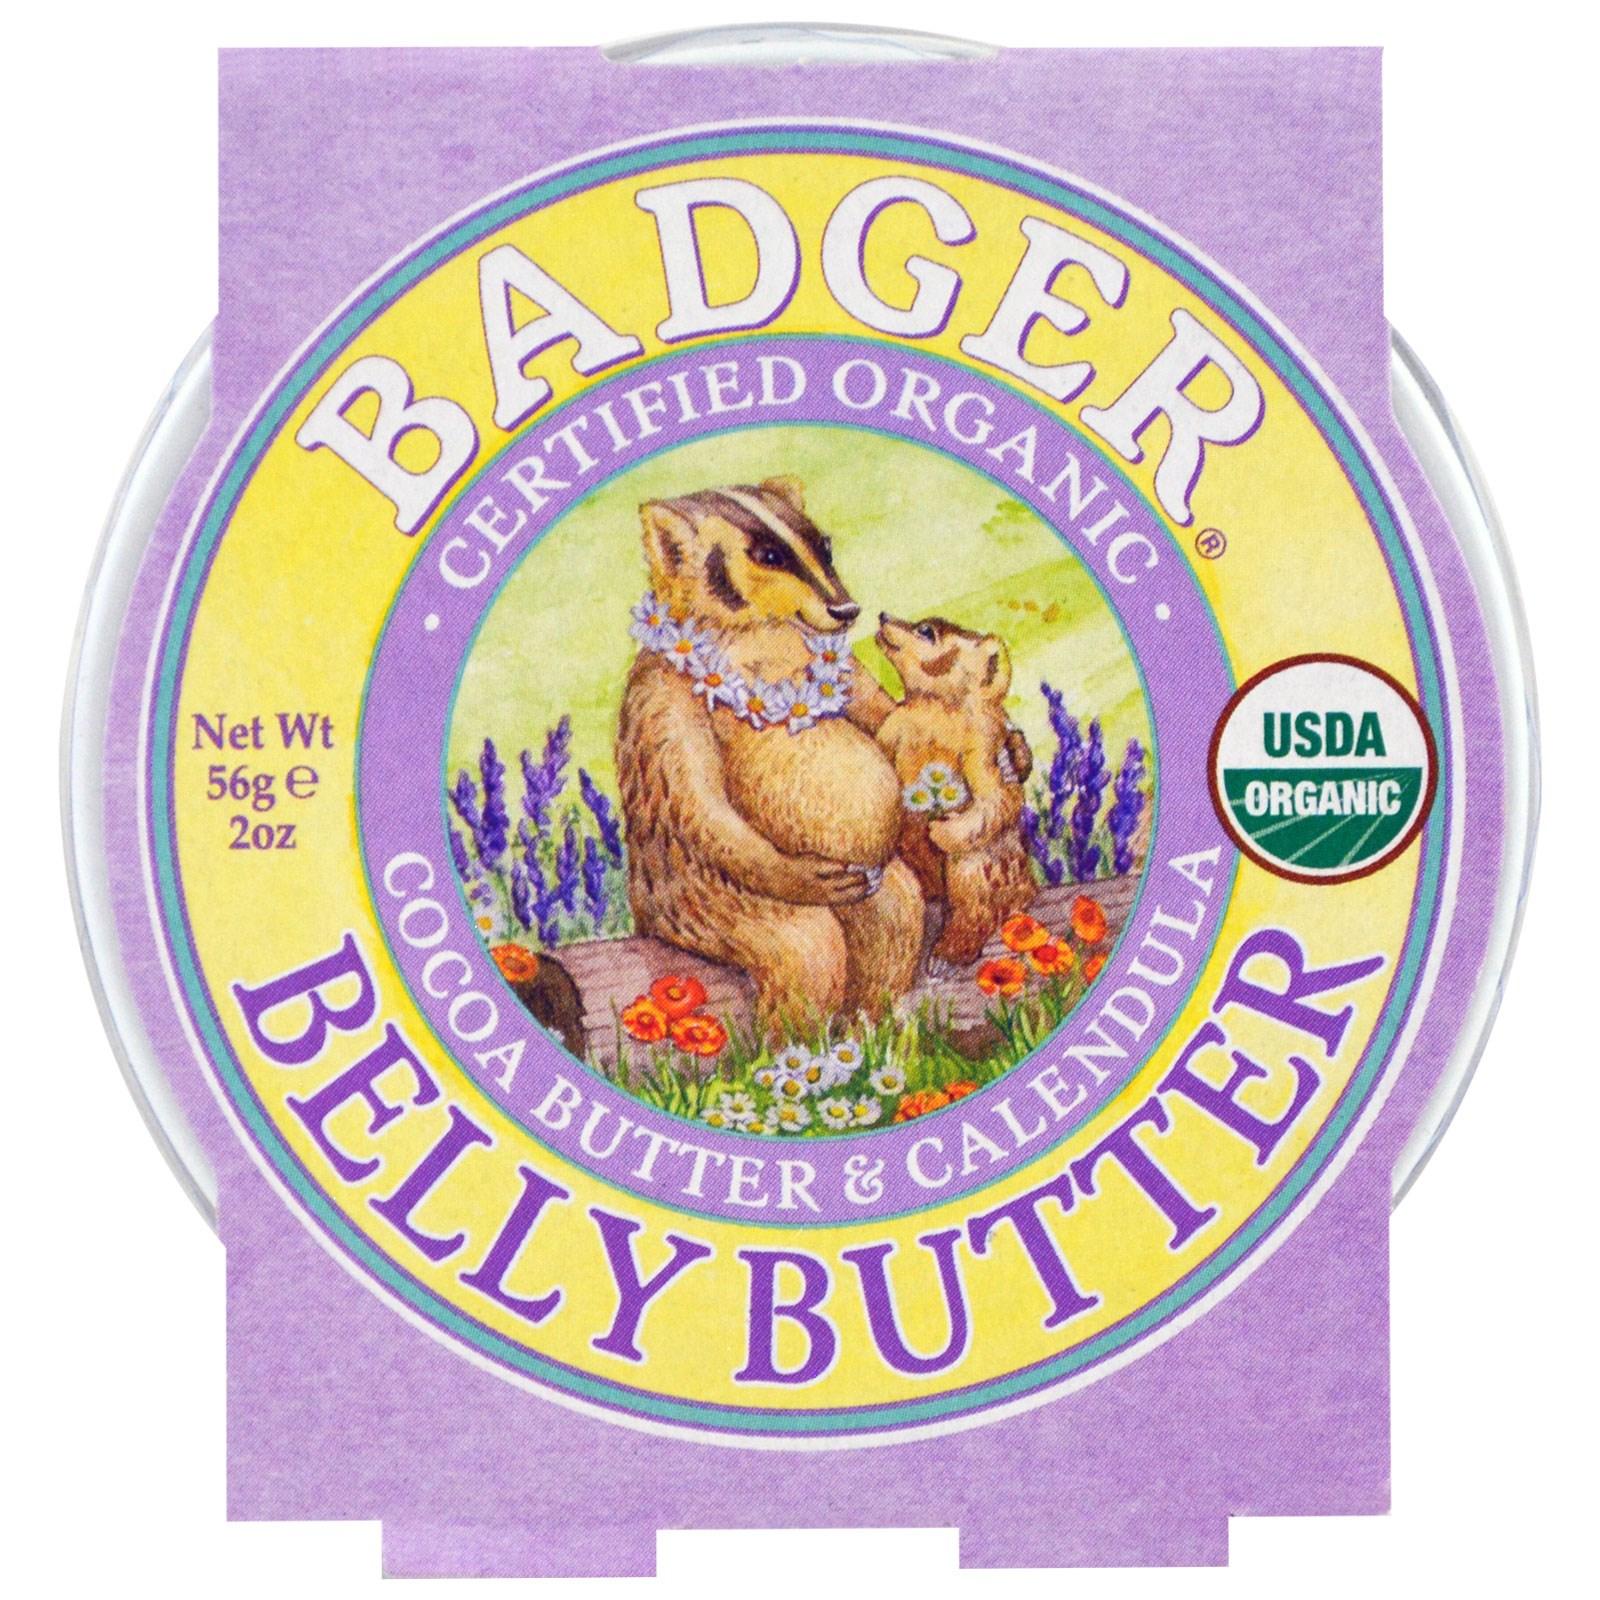 Badger - Sleep Balm - Lavender and Bergamot (2 Oz) - 1 Pack Novexpert - Expert Radiance Program - The Expert Exfoliator Mask & Scrub -50ml/1.9oz